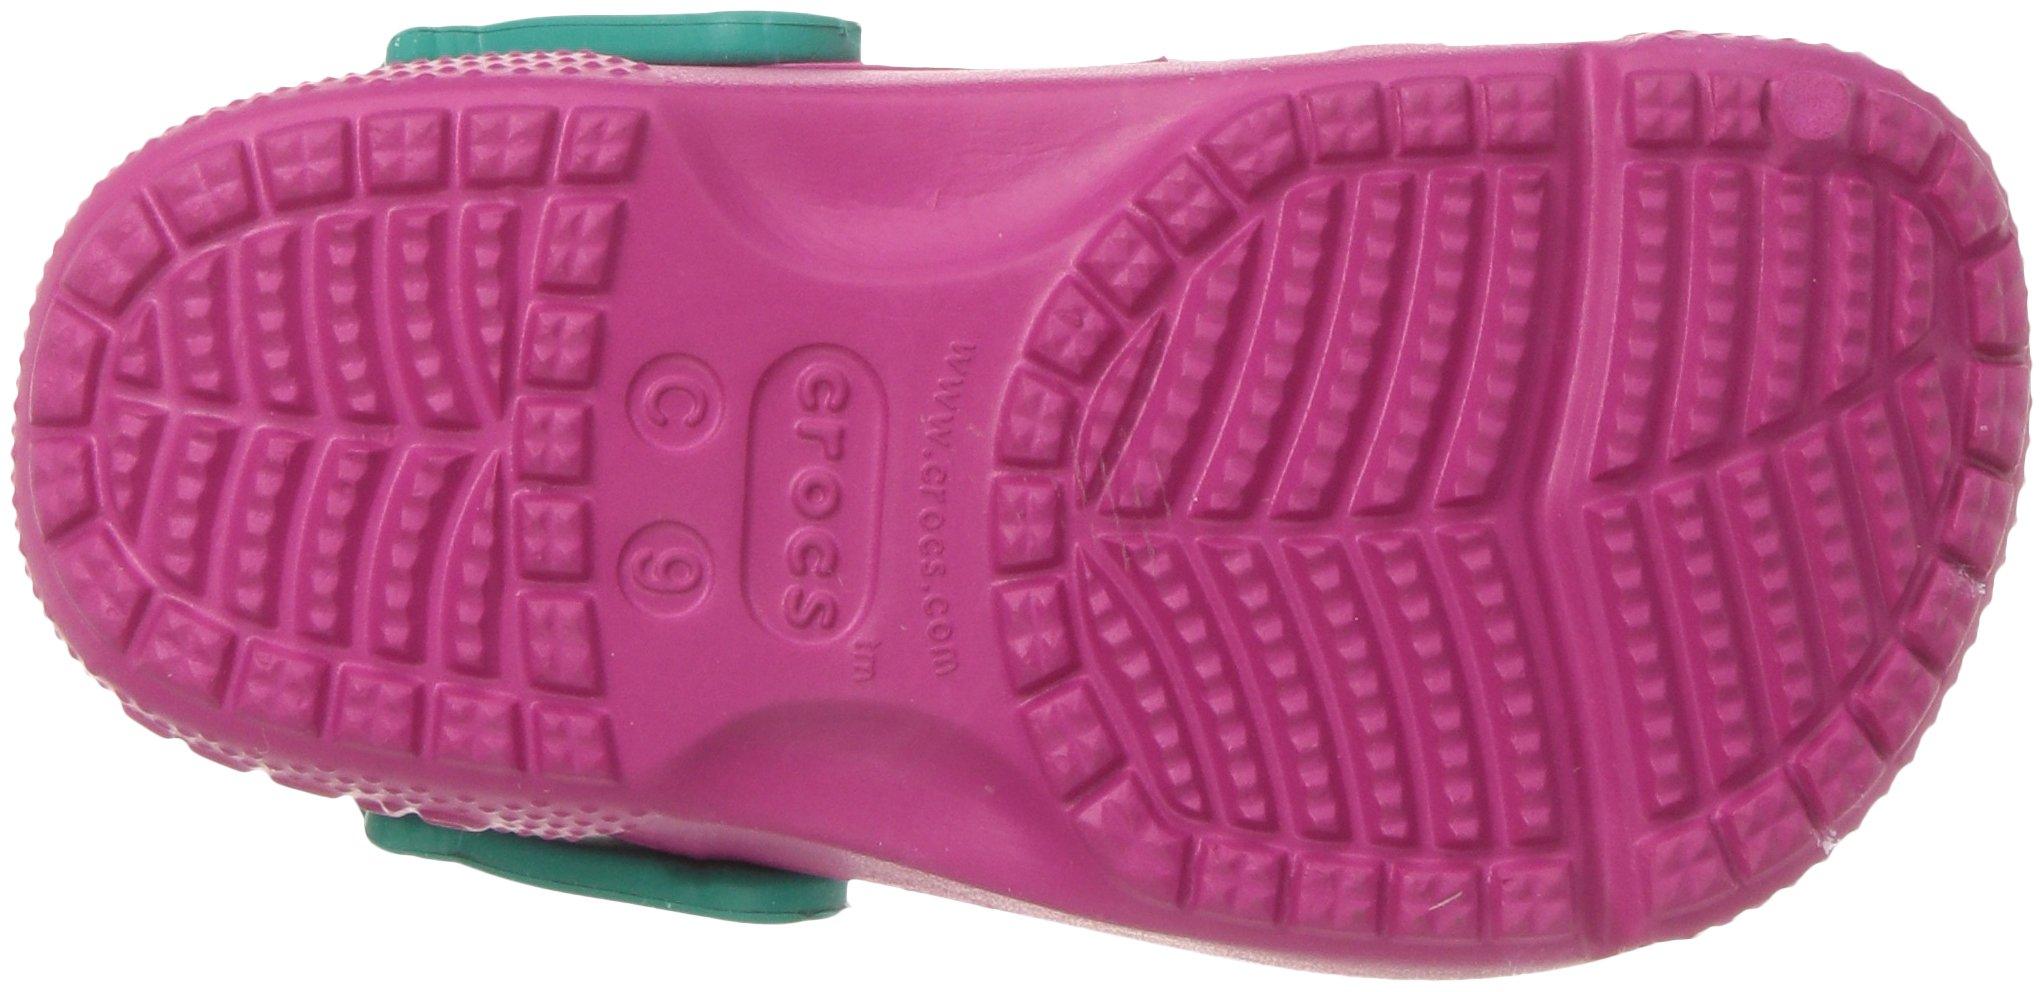 Crocs Girls' Fun Lab Frozen Clog K, Candy Pink, 10 M US Little Kid by Crocs (Image #3)